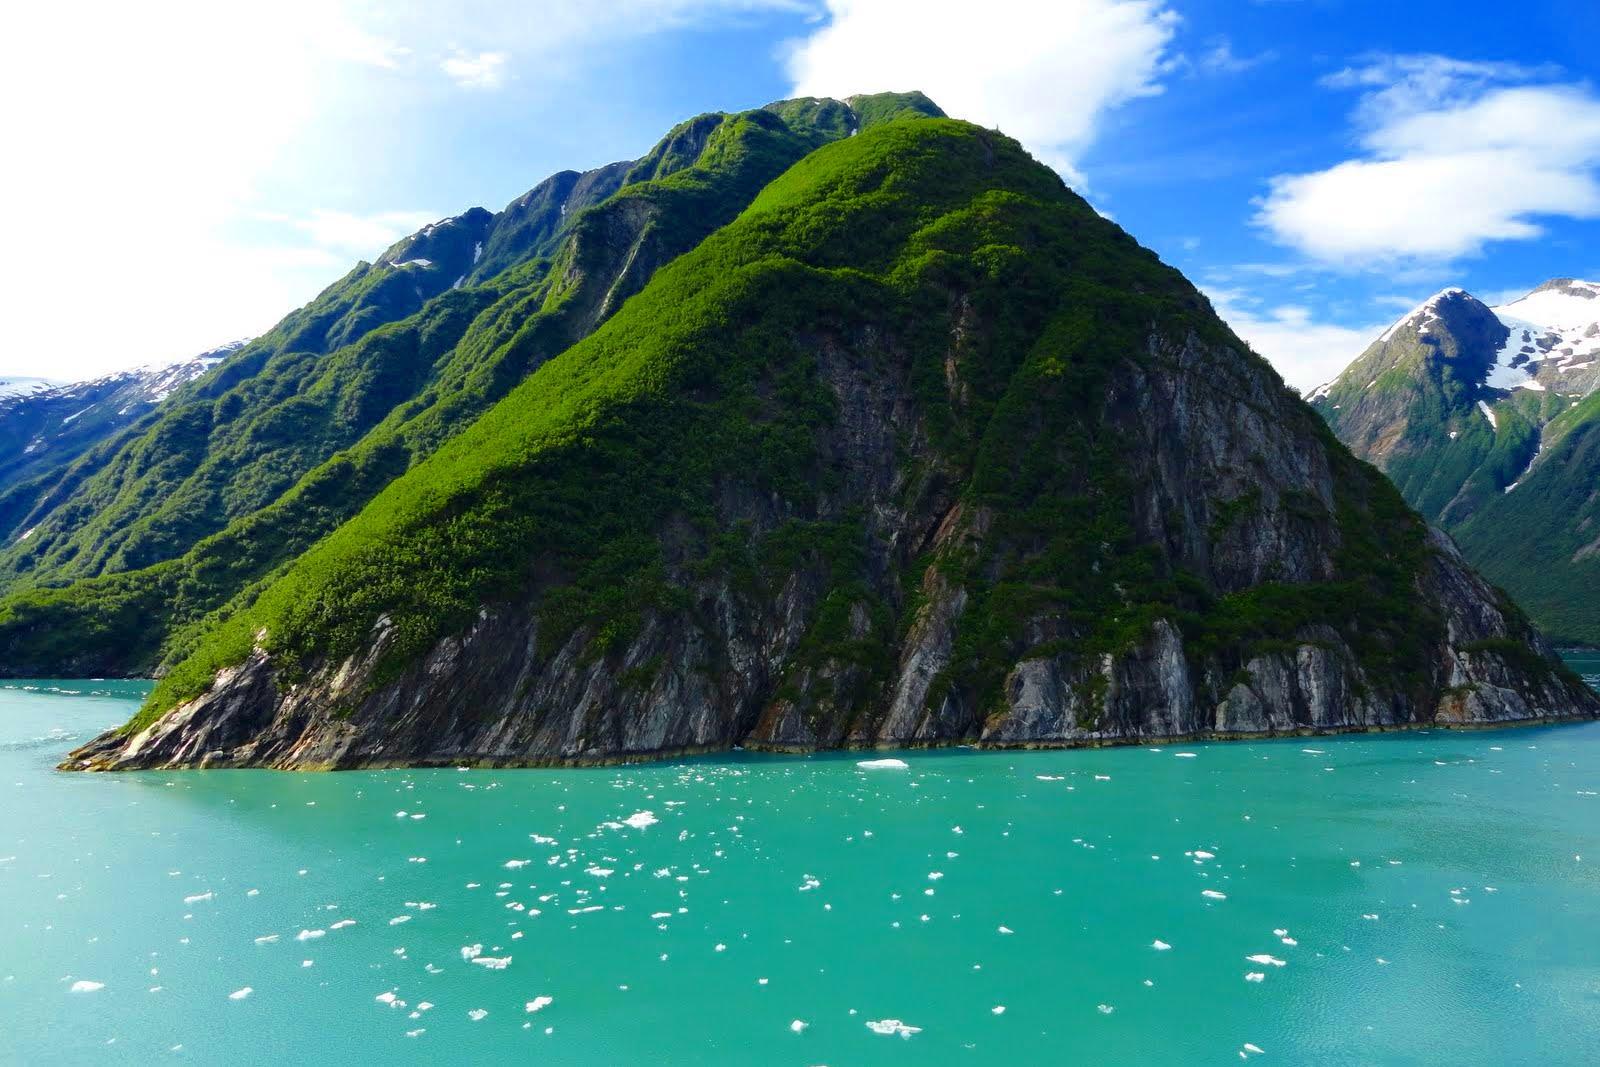 Cruise Tracy Arm Fjord, Alaska